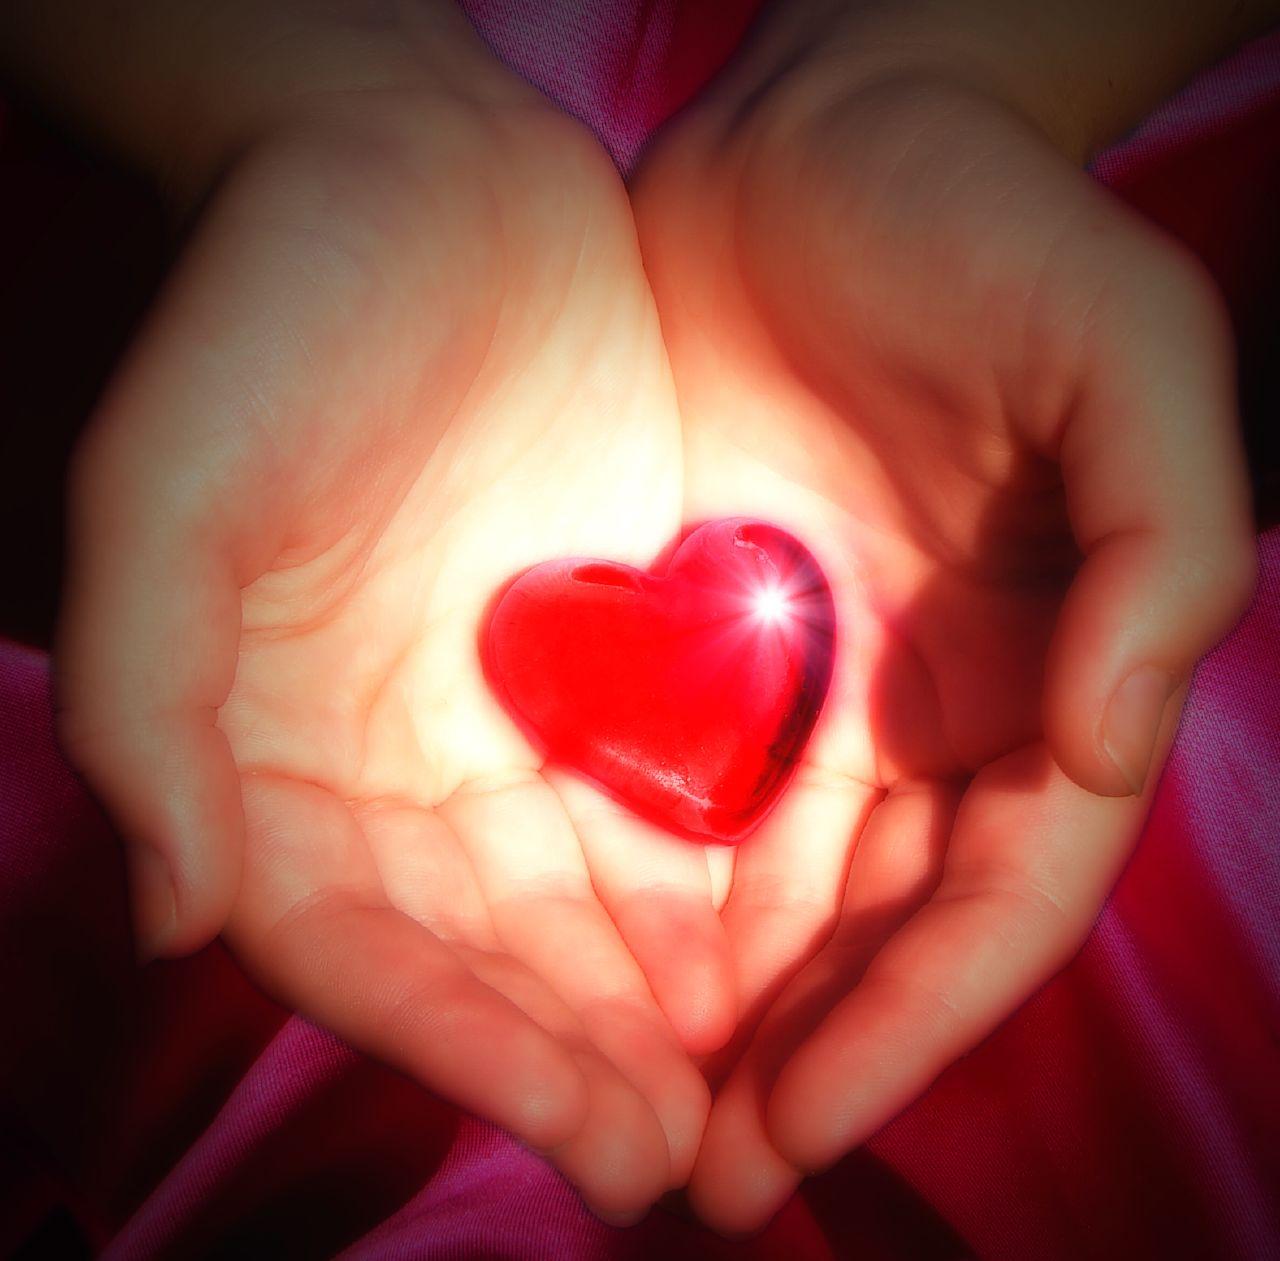 Cerpen Cinta Ini Untukmu By Dheasy